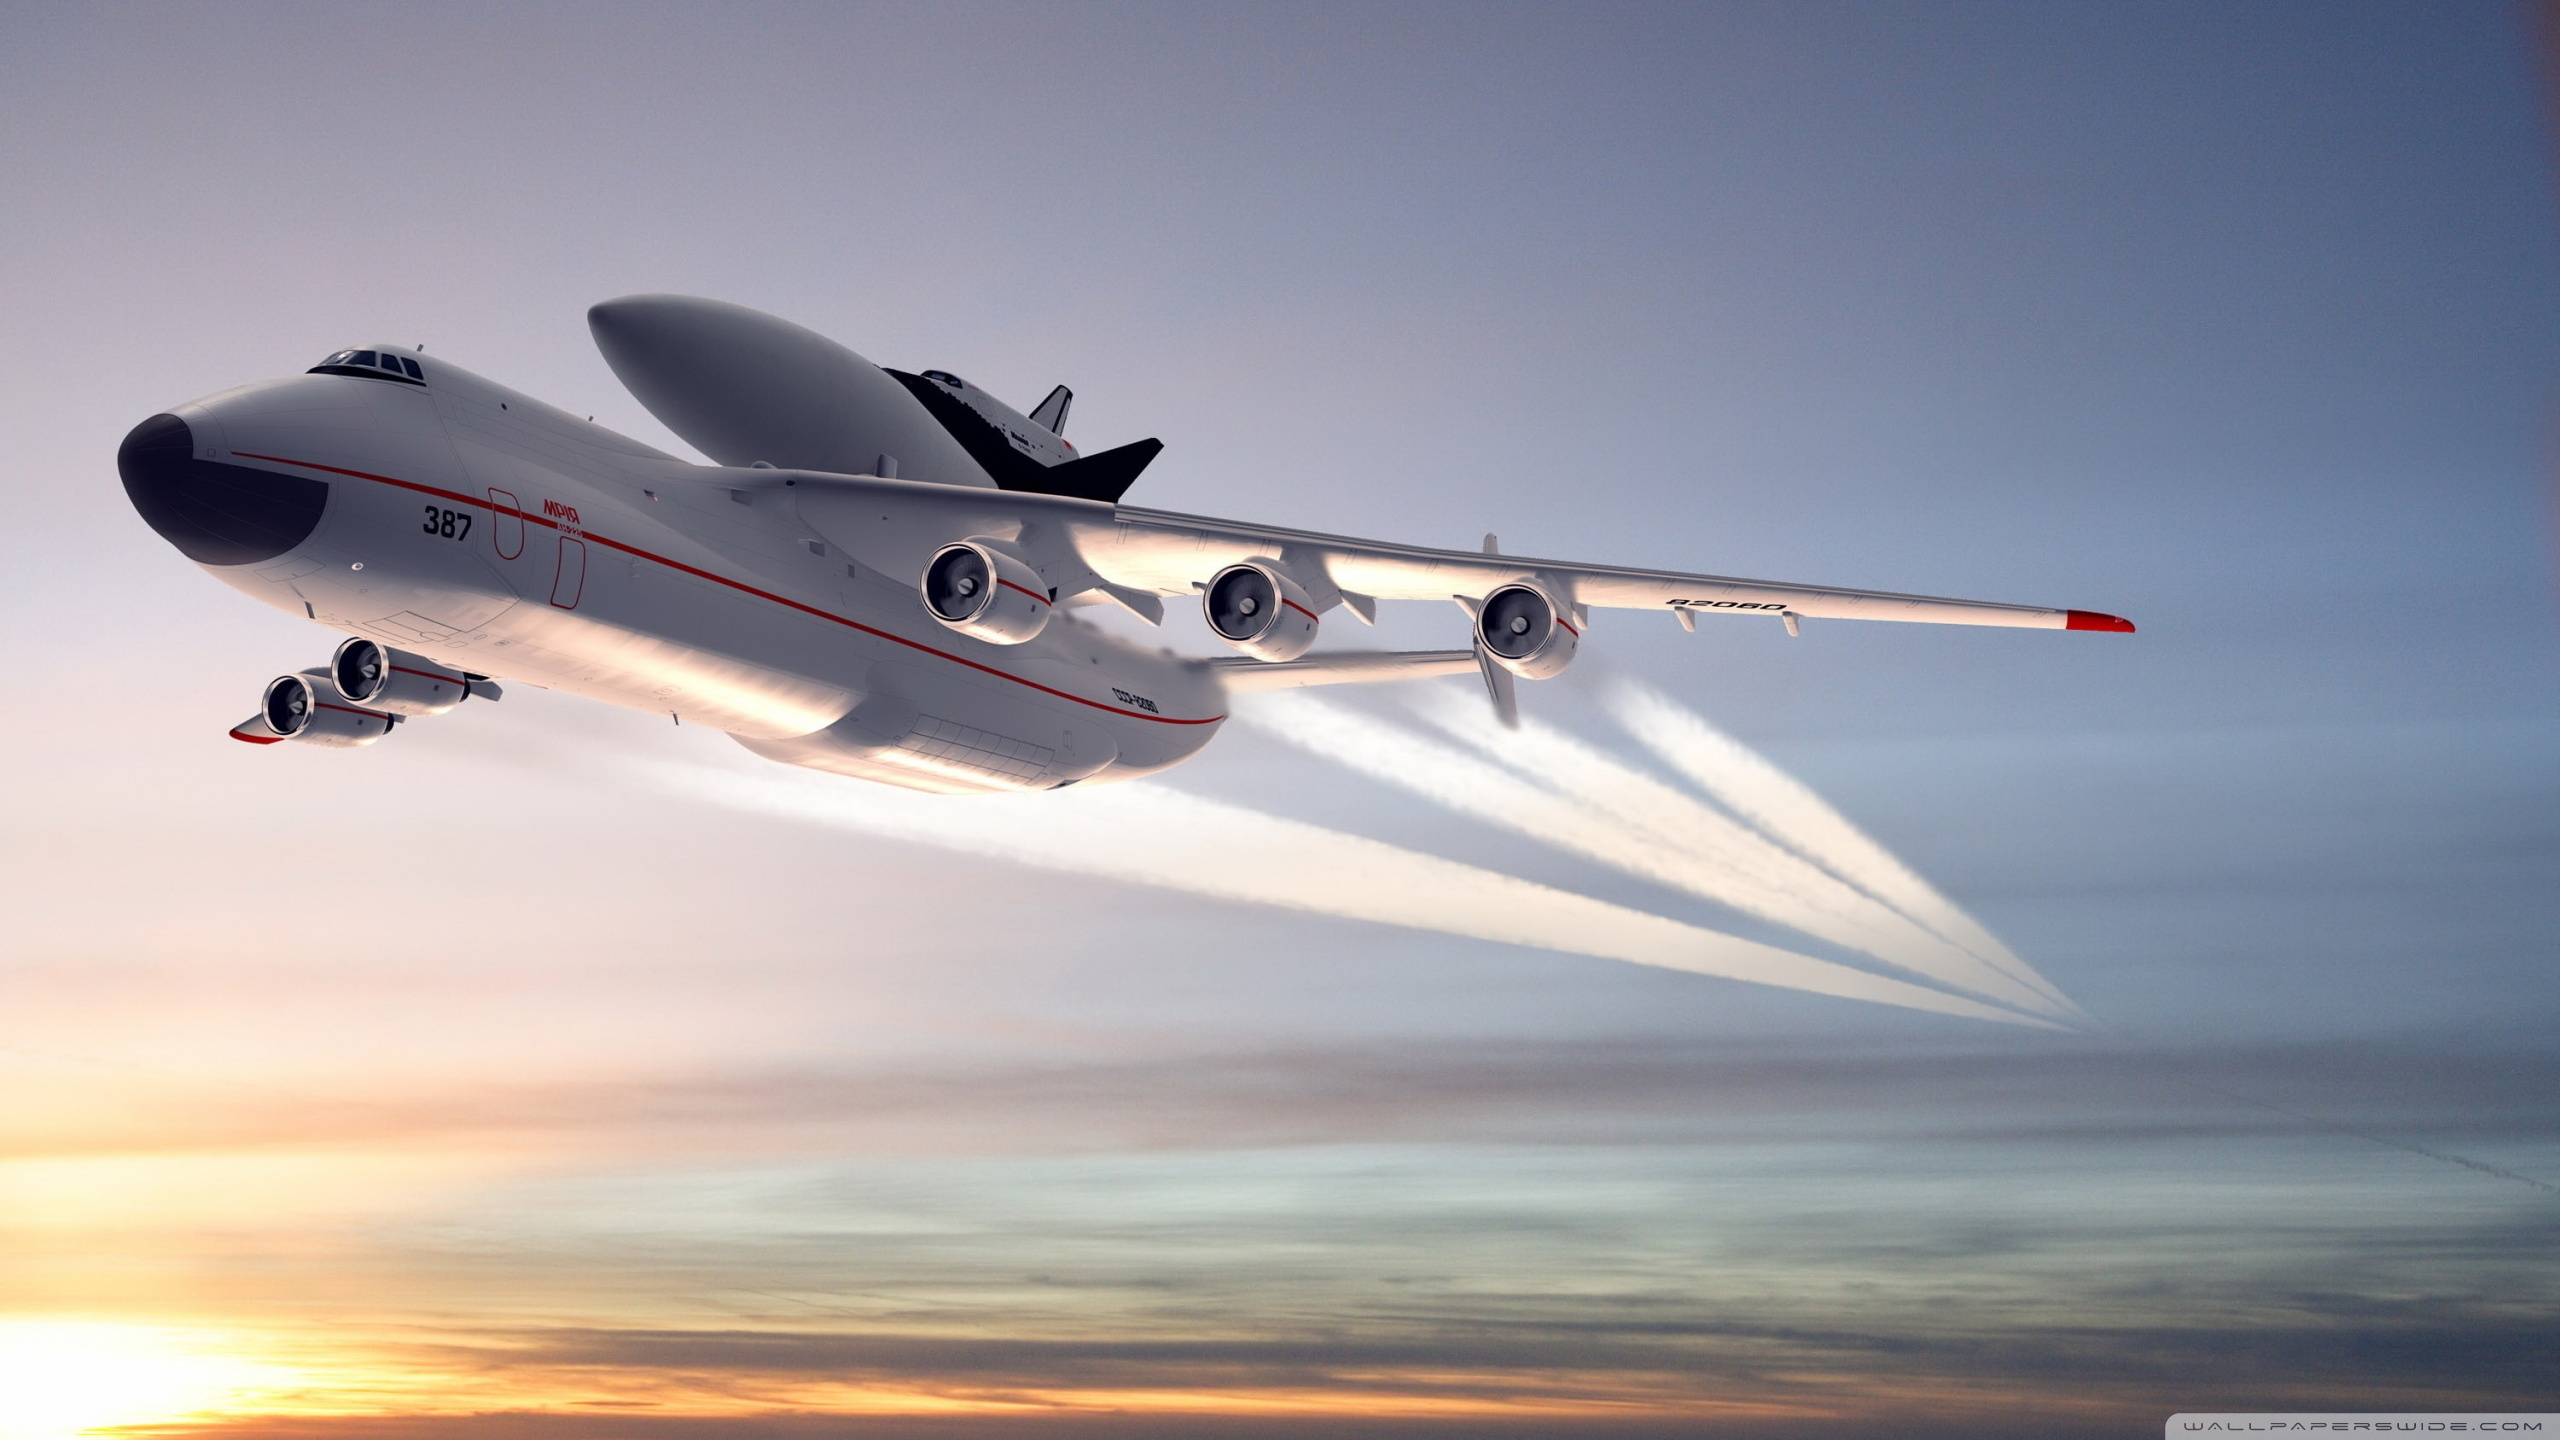 Standard - Simpleplanes Antonov An 225 , HD Wallpaper & Backgrounds